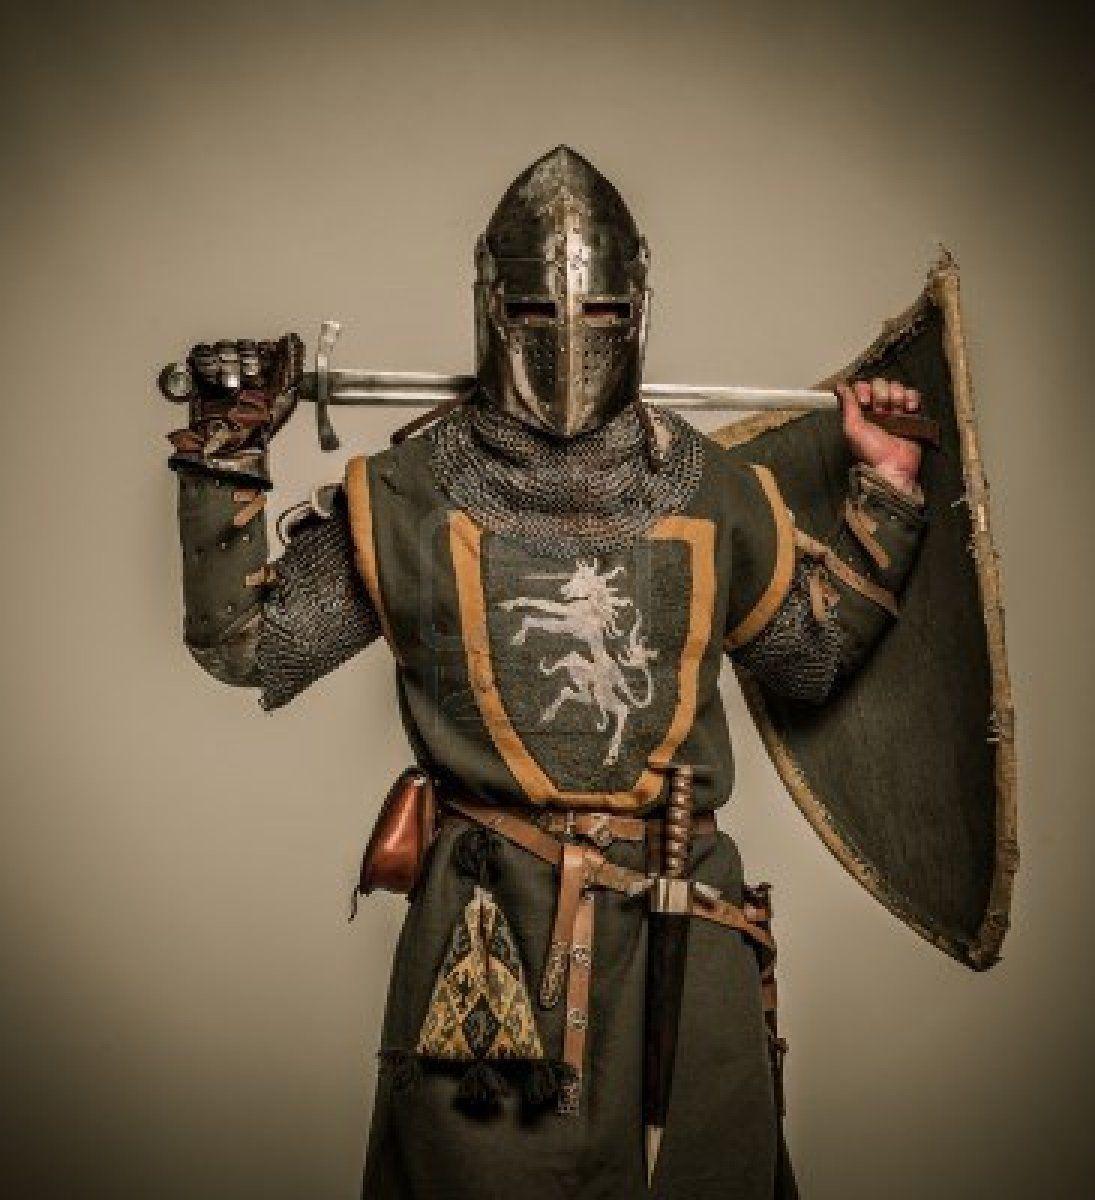 [74+] Medieval Knight Wallpaper On WallpaperSafari